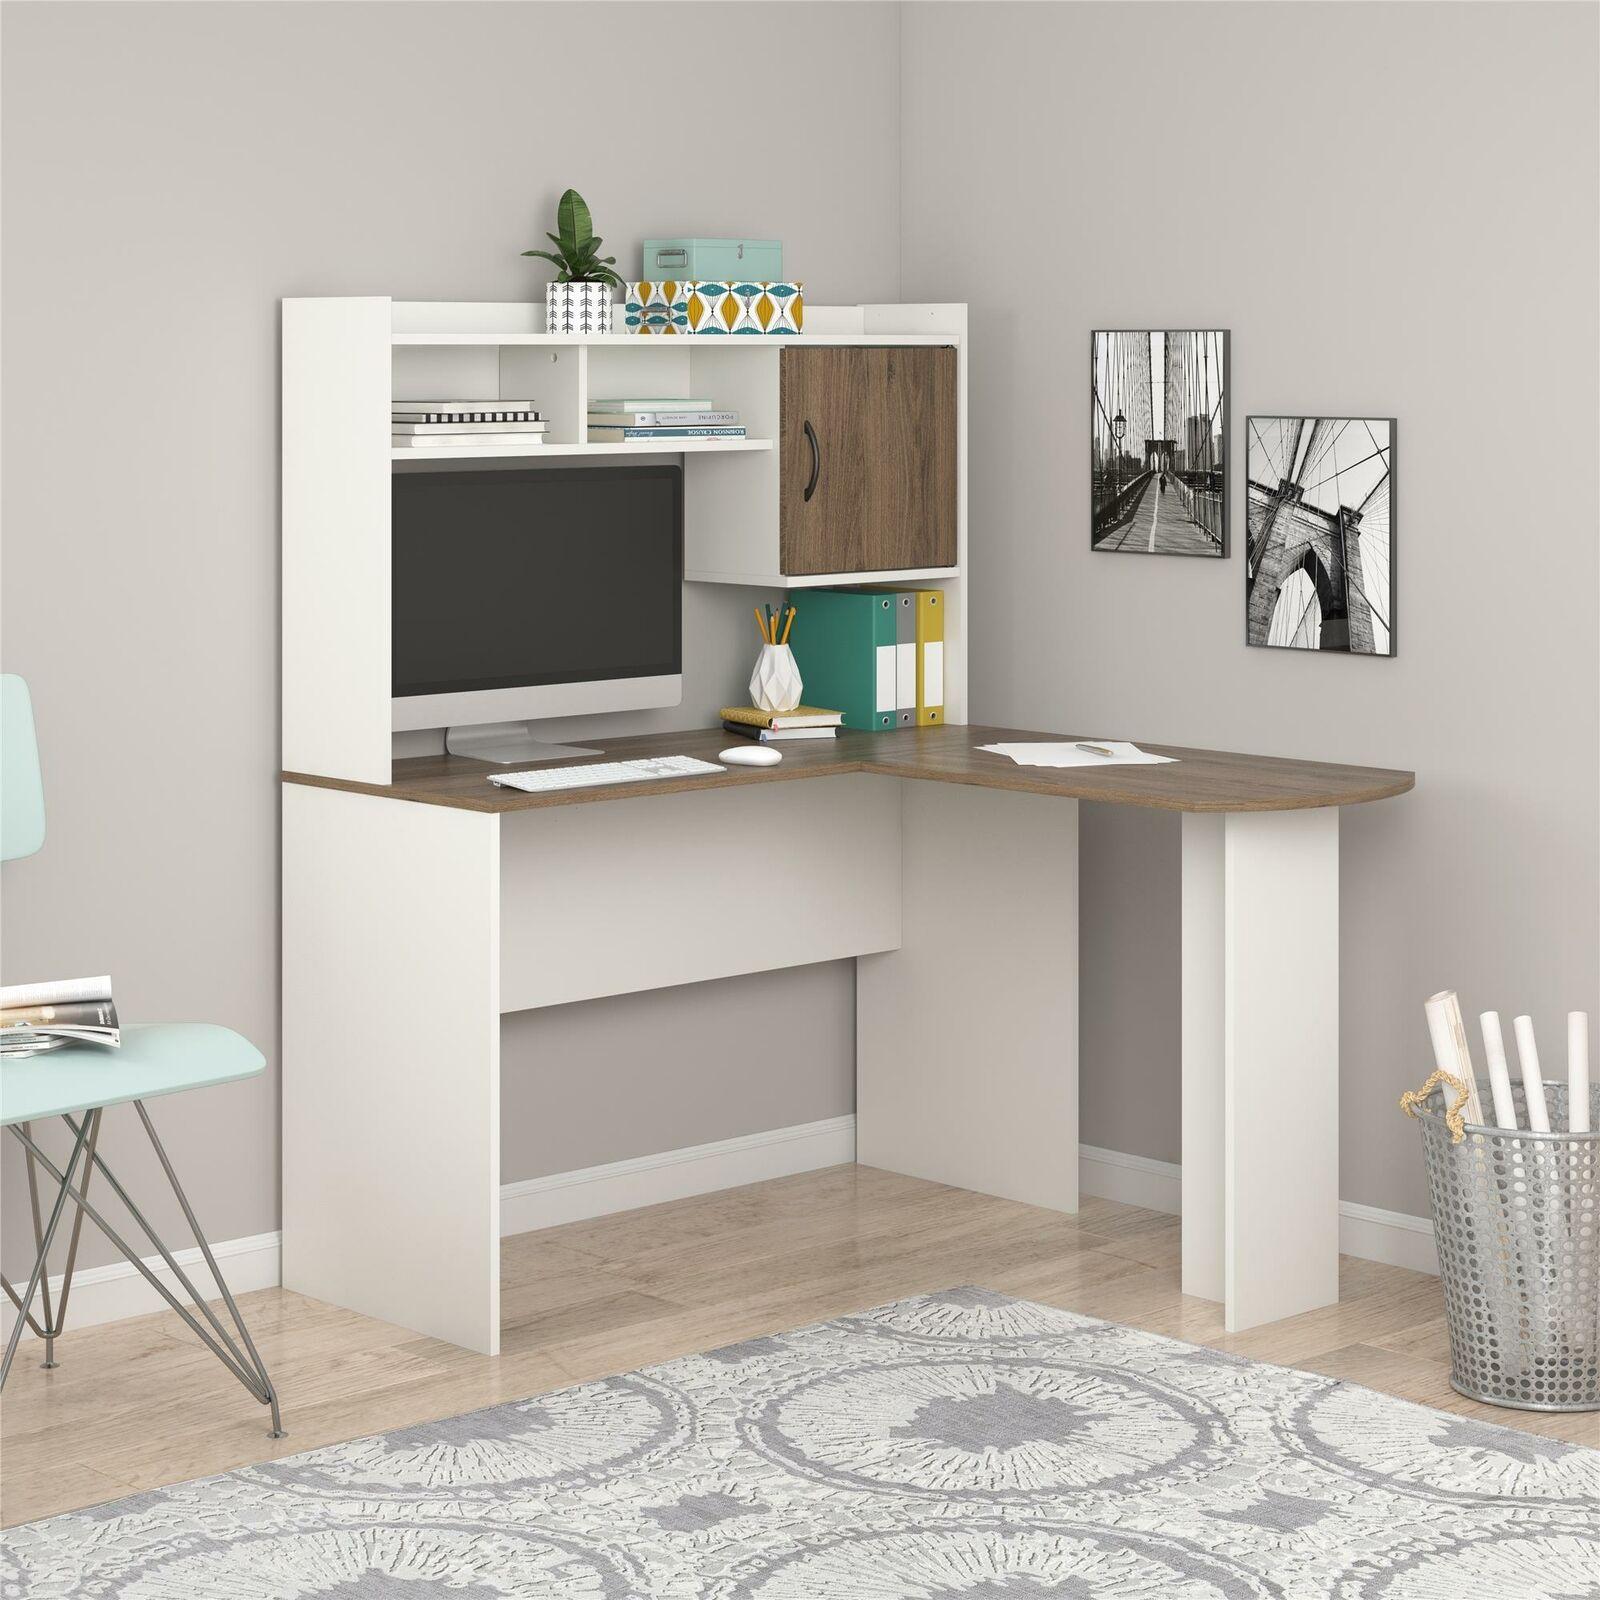 Home Office Desks Aleko Cd03bk Contemporary Swivel Corner L Shaped Dark Brown For Sale Online Ebay